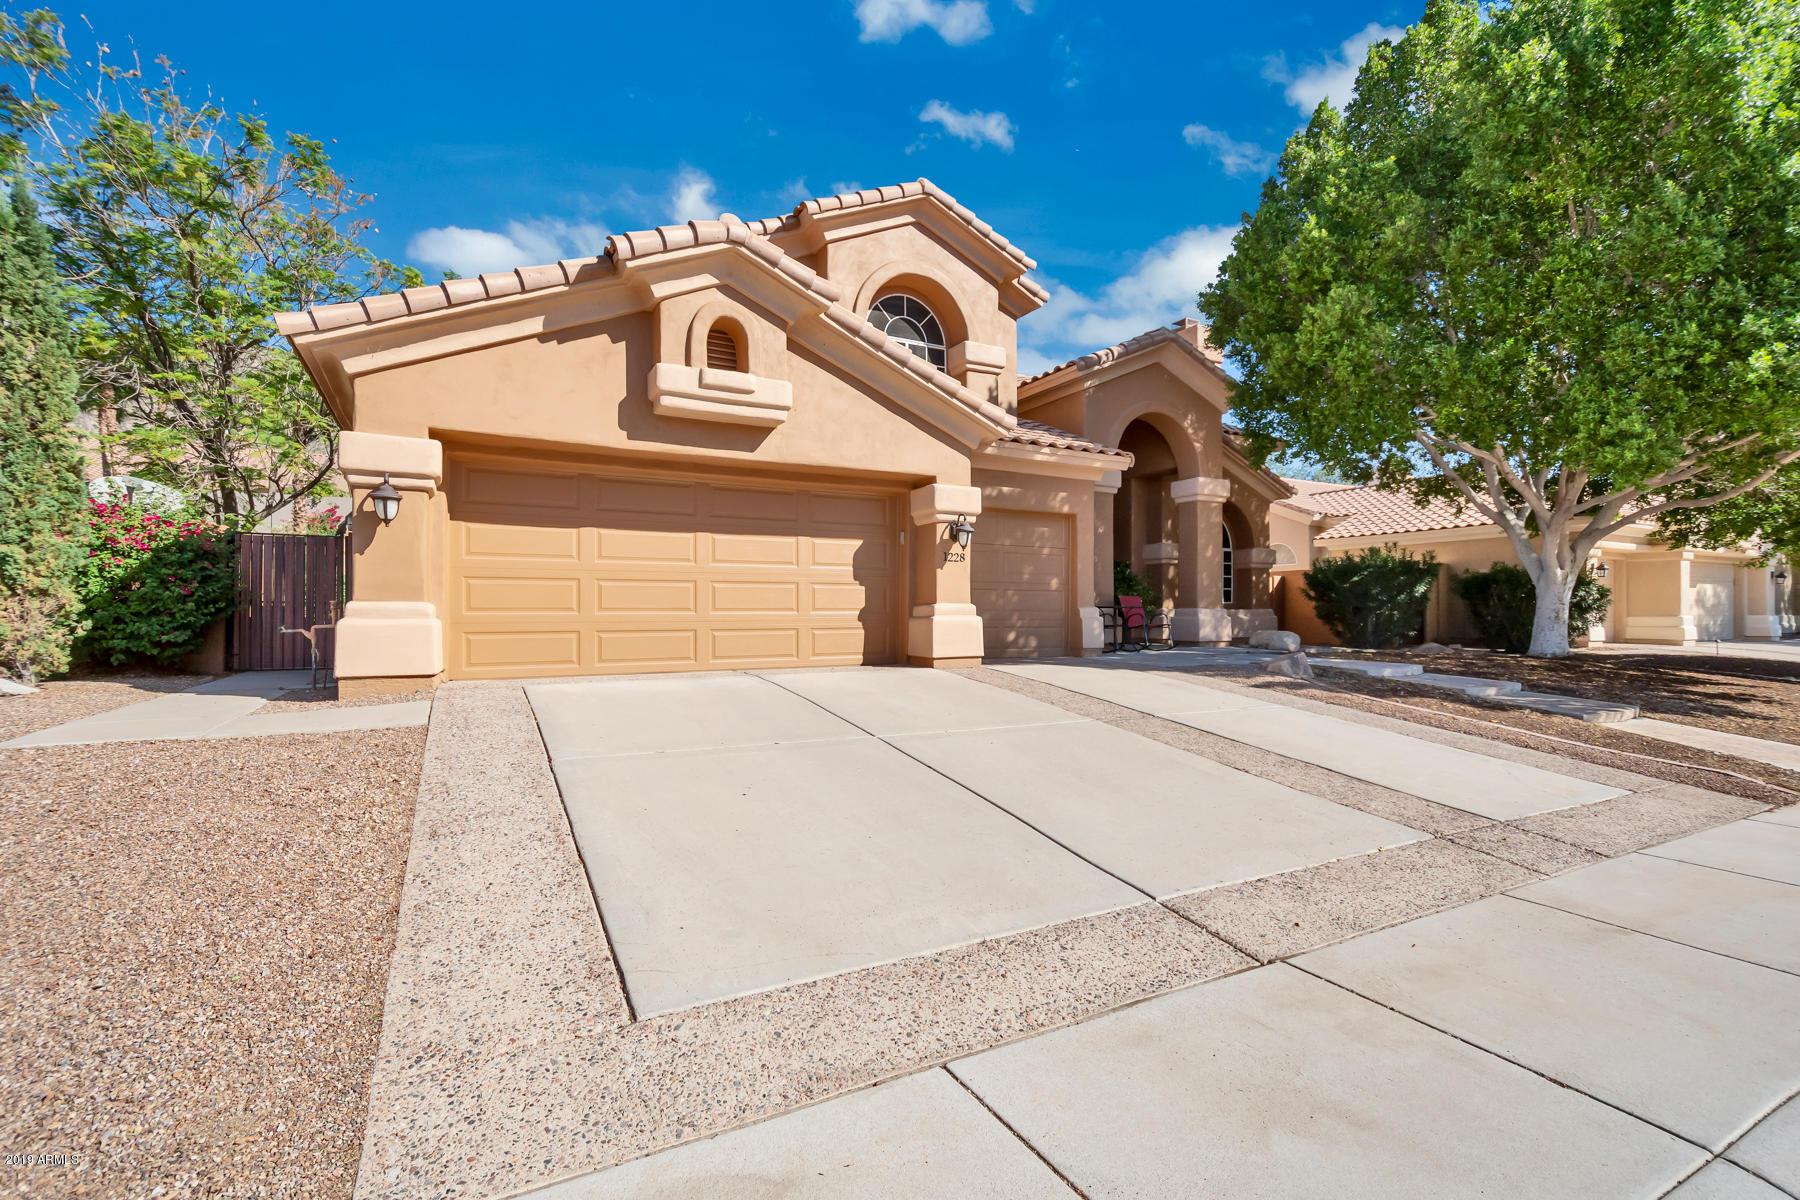 Photo of 1228 E SQUAWBUSH Place, Phoenix, AZ 85048